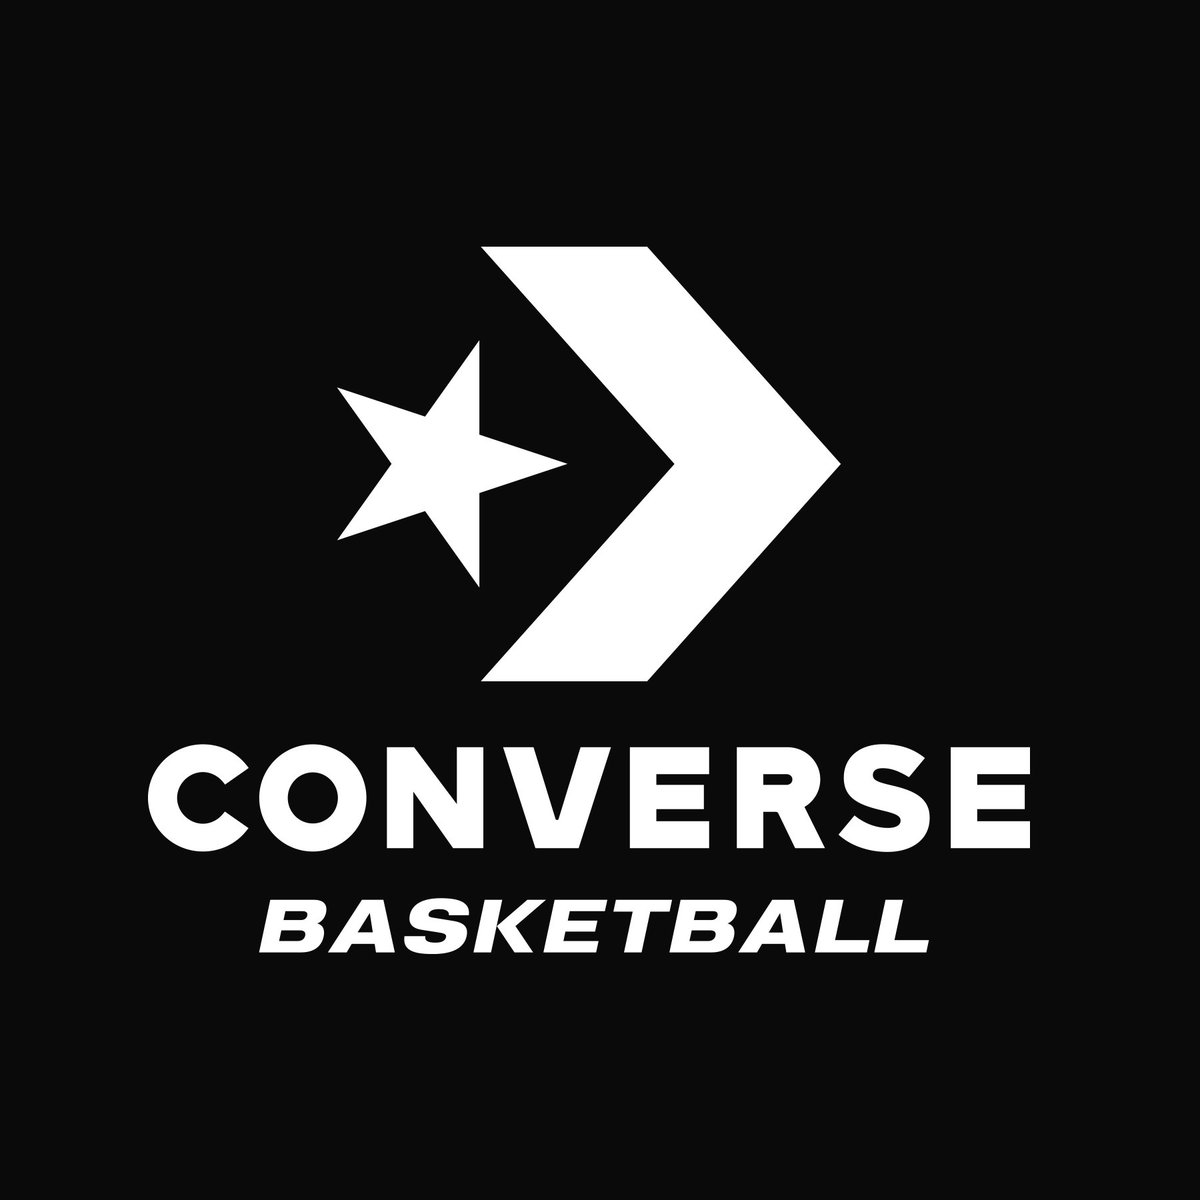 027da32958ed Converse Basketball branding http   www.joerperez.com converse-basketball   … JOE PEREZ STUDIOS CREATIVE DIRECTION  JOE PEREZ ART DIRECTION + DESIGN   HARIS ...